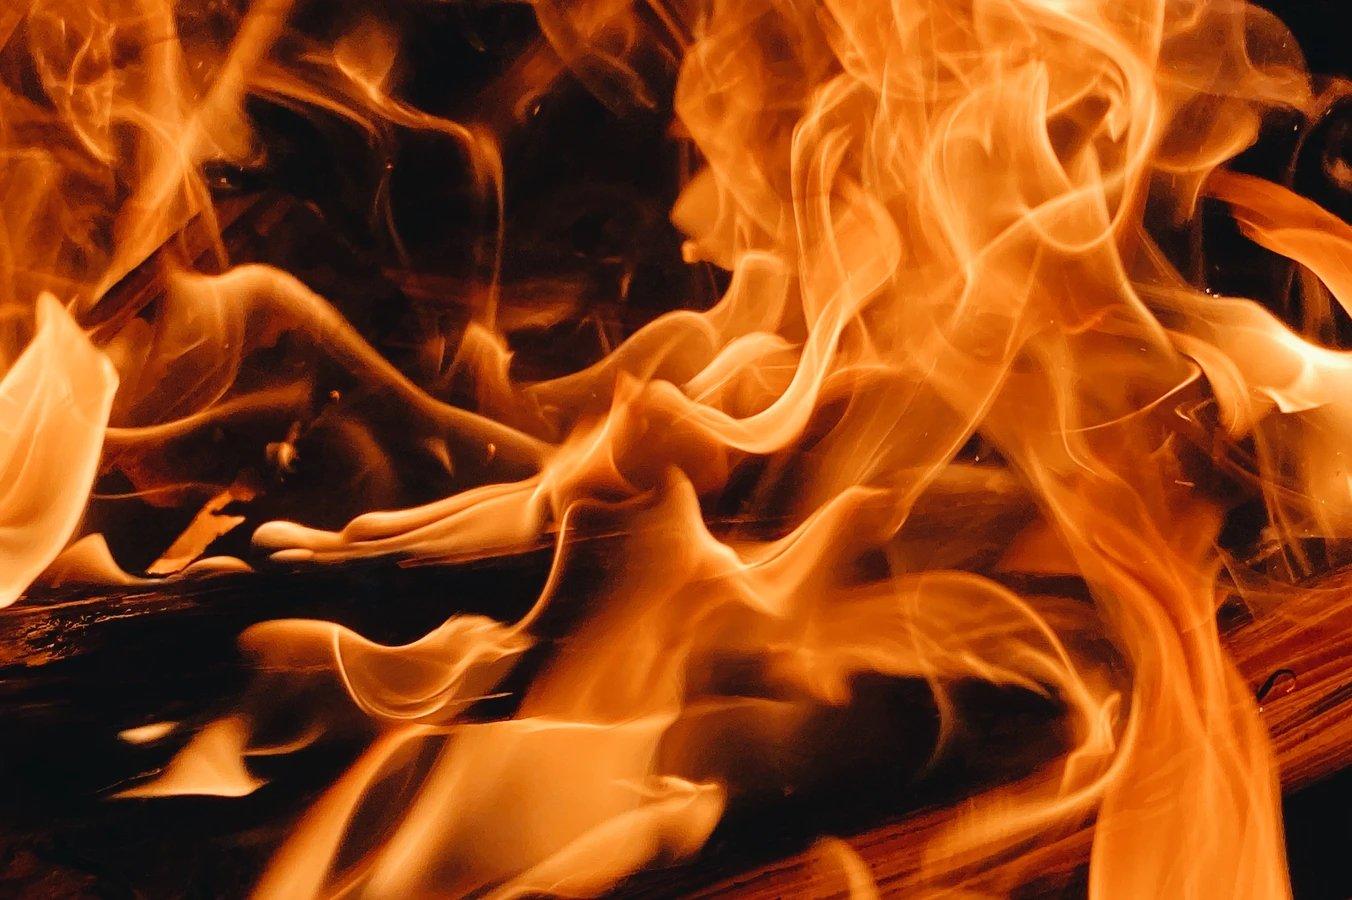 fogo vivo